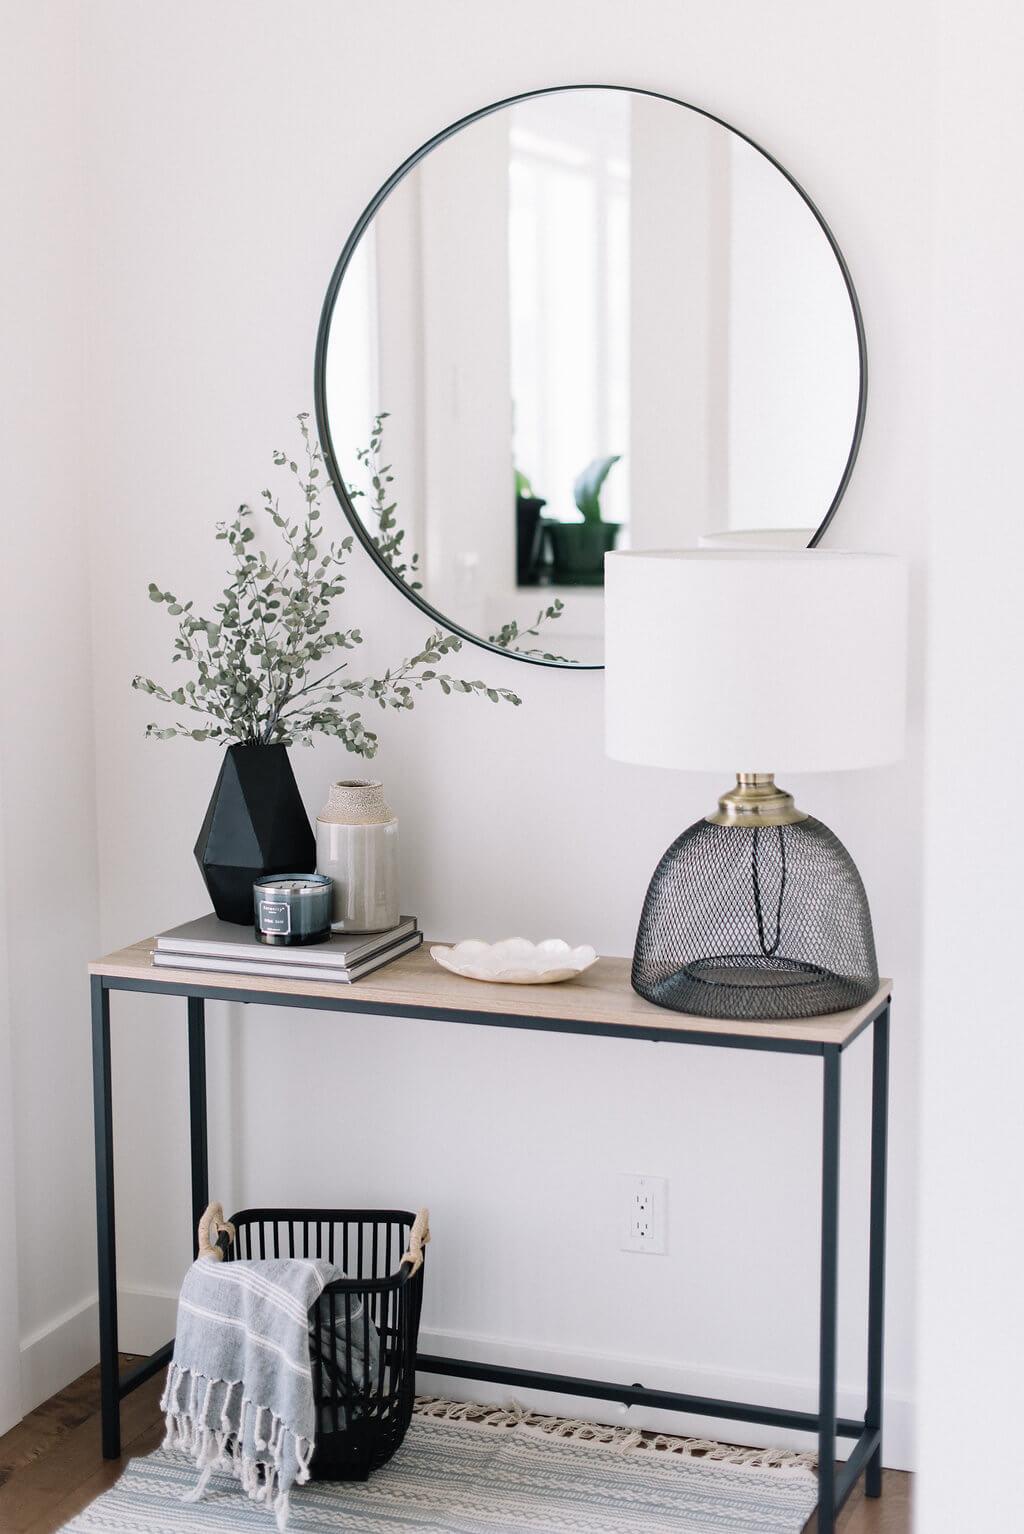 чёрно-белые идеи домашнего декора фото 7